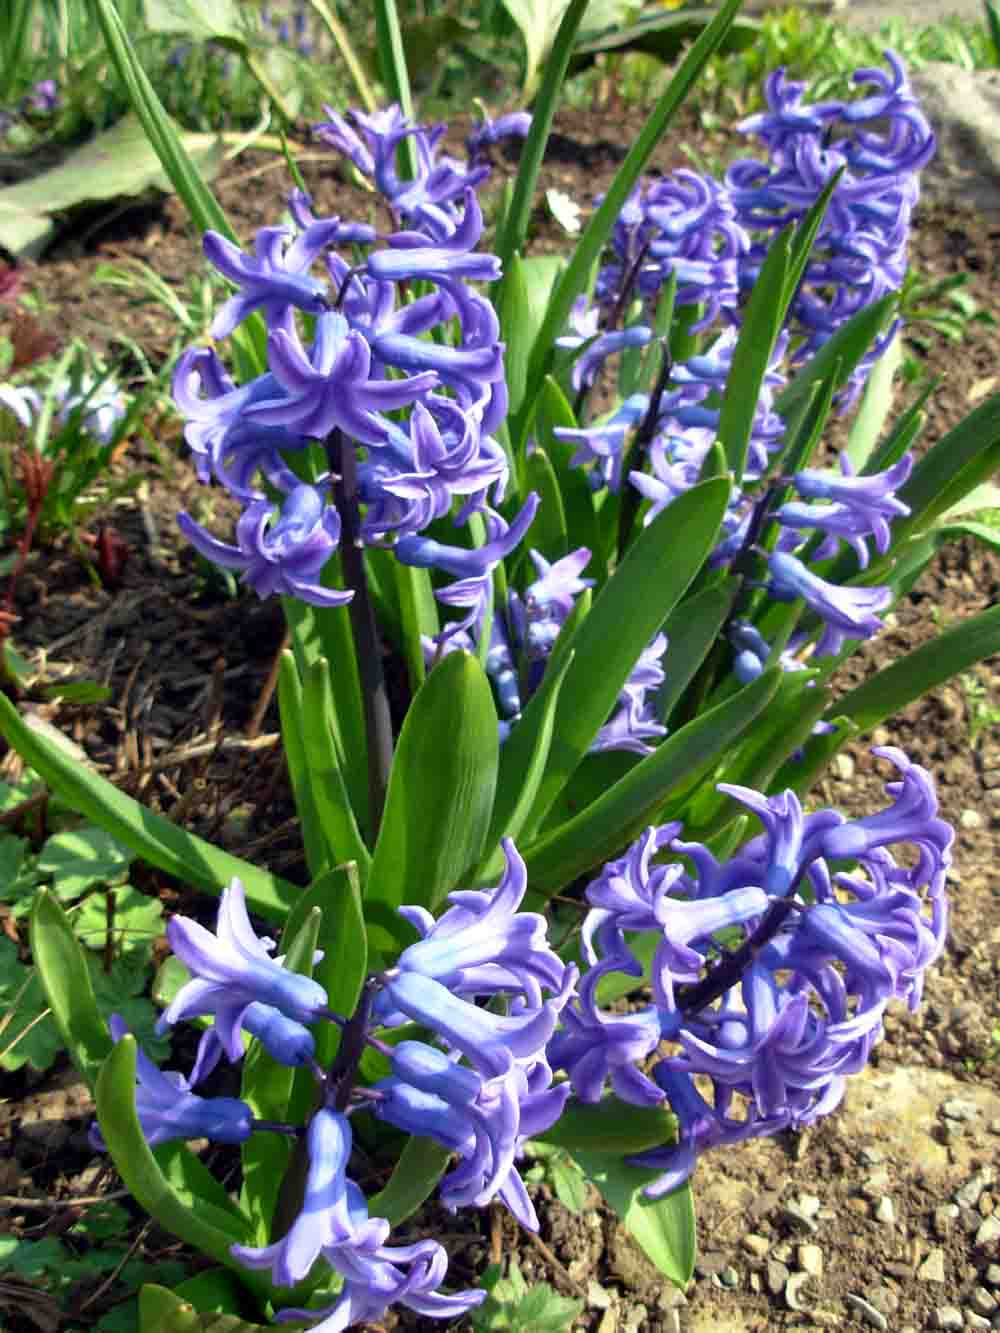 Hyacinth Flower A Lovely Spring Flower